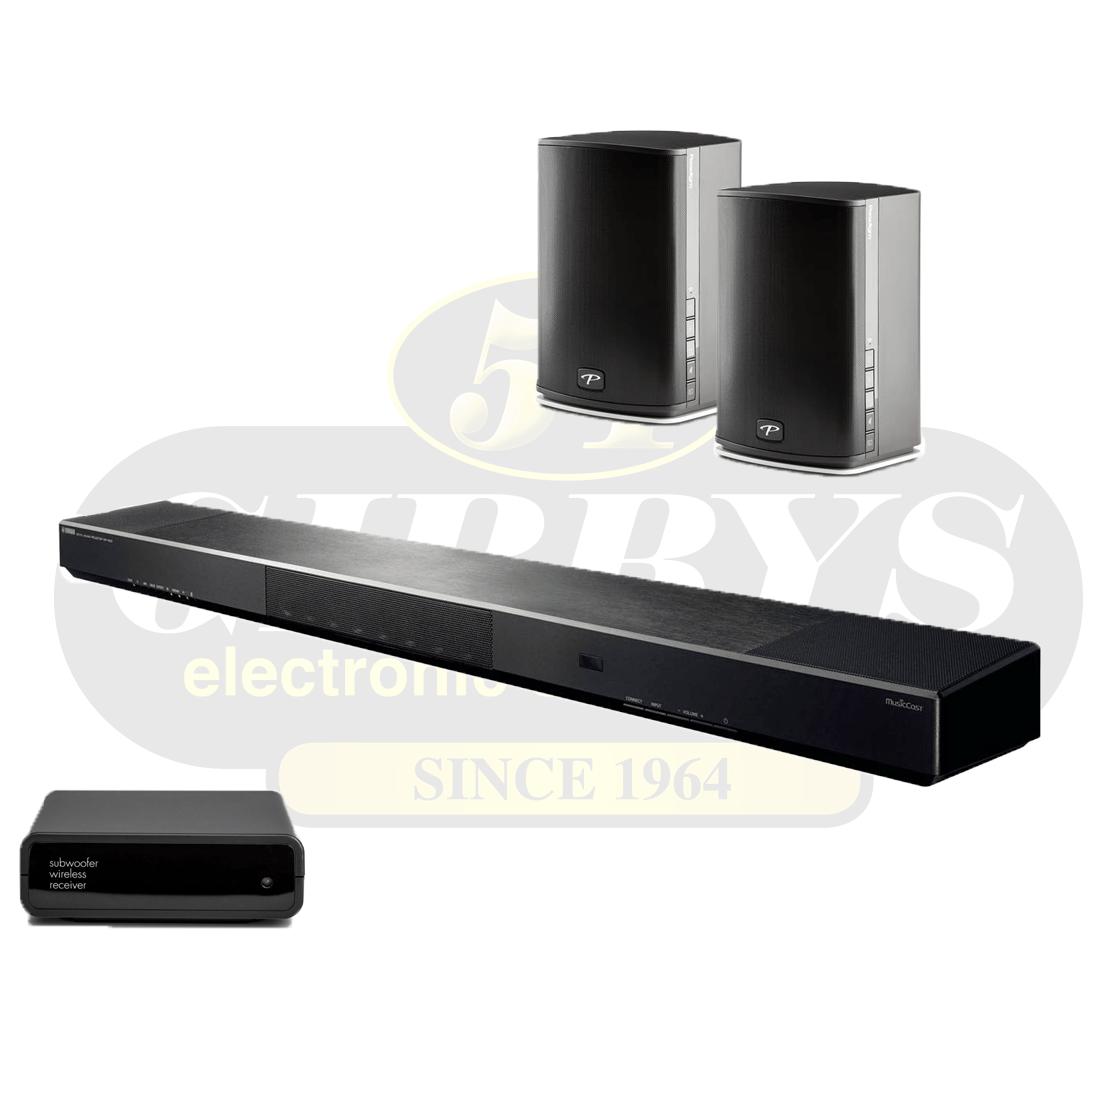 Paradigm Pw Soundbar 46 Pw 600 Wireless Stereo Speakers Black  # Meuble Tv Ultra Compact